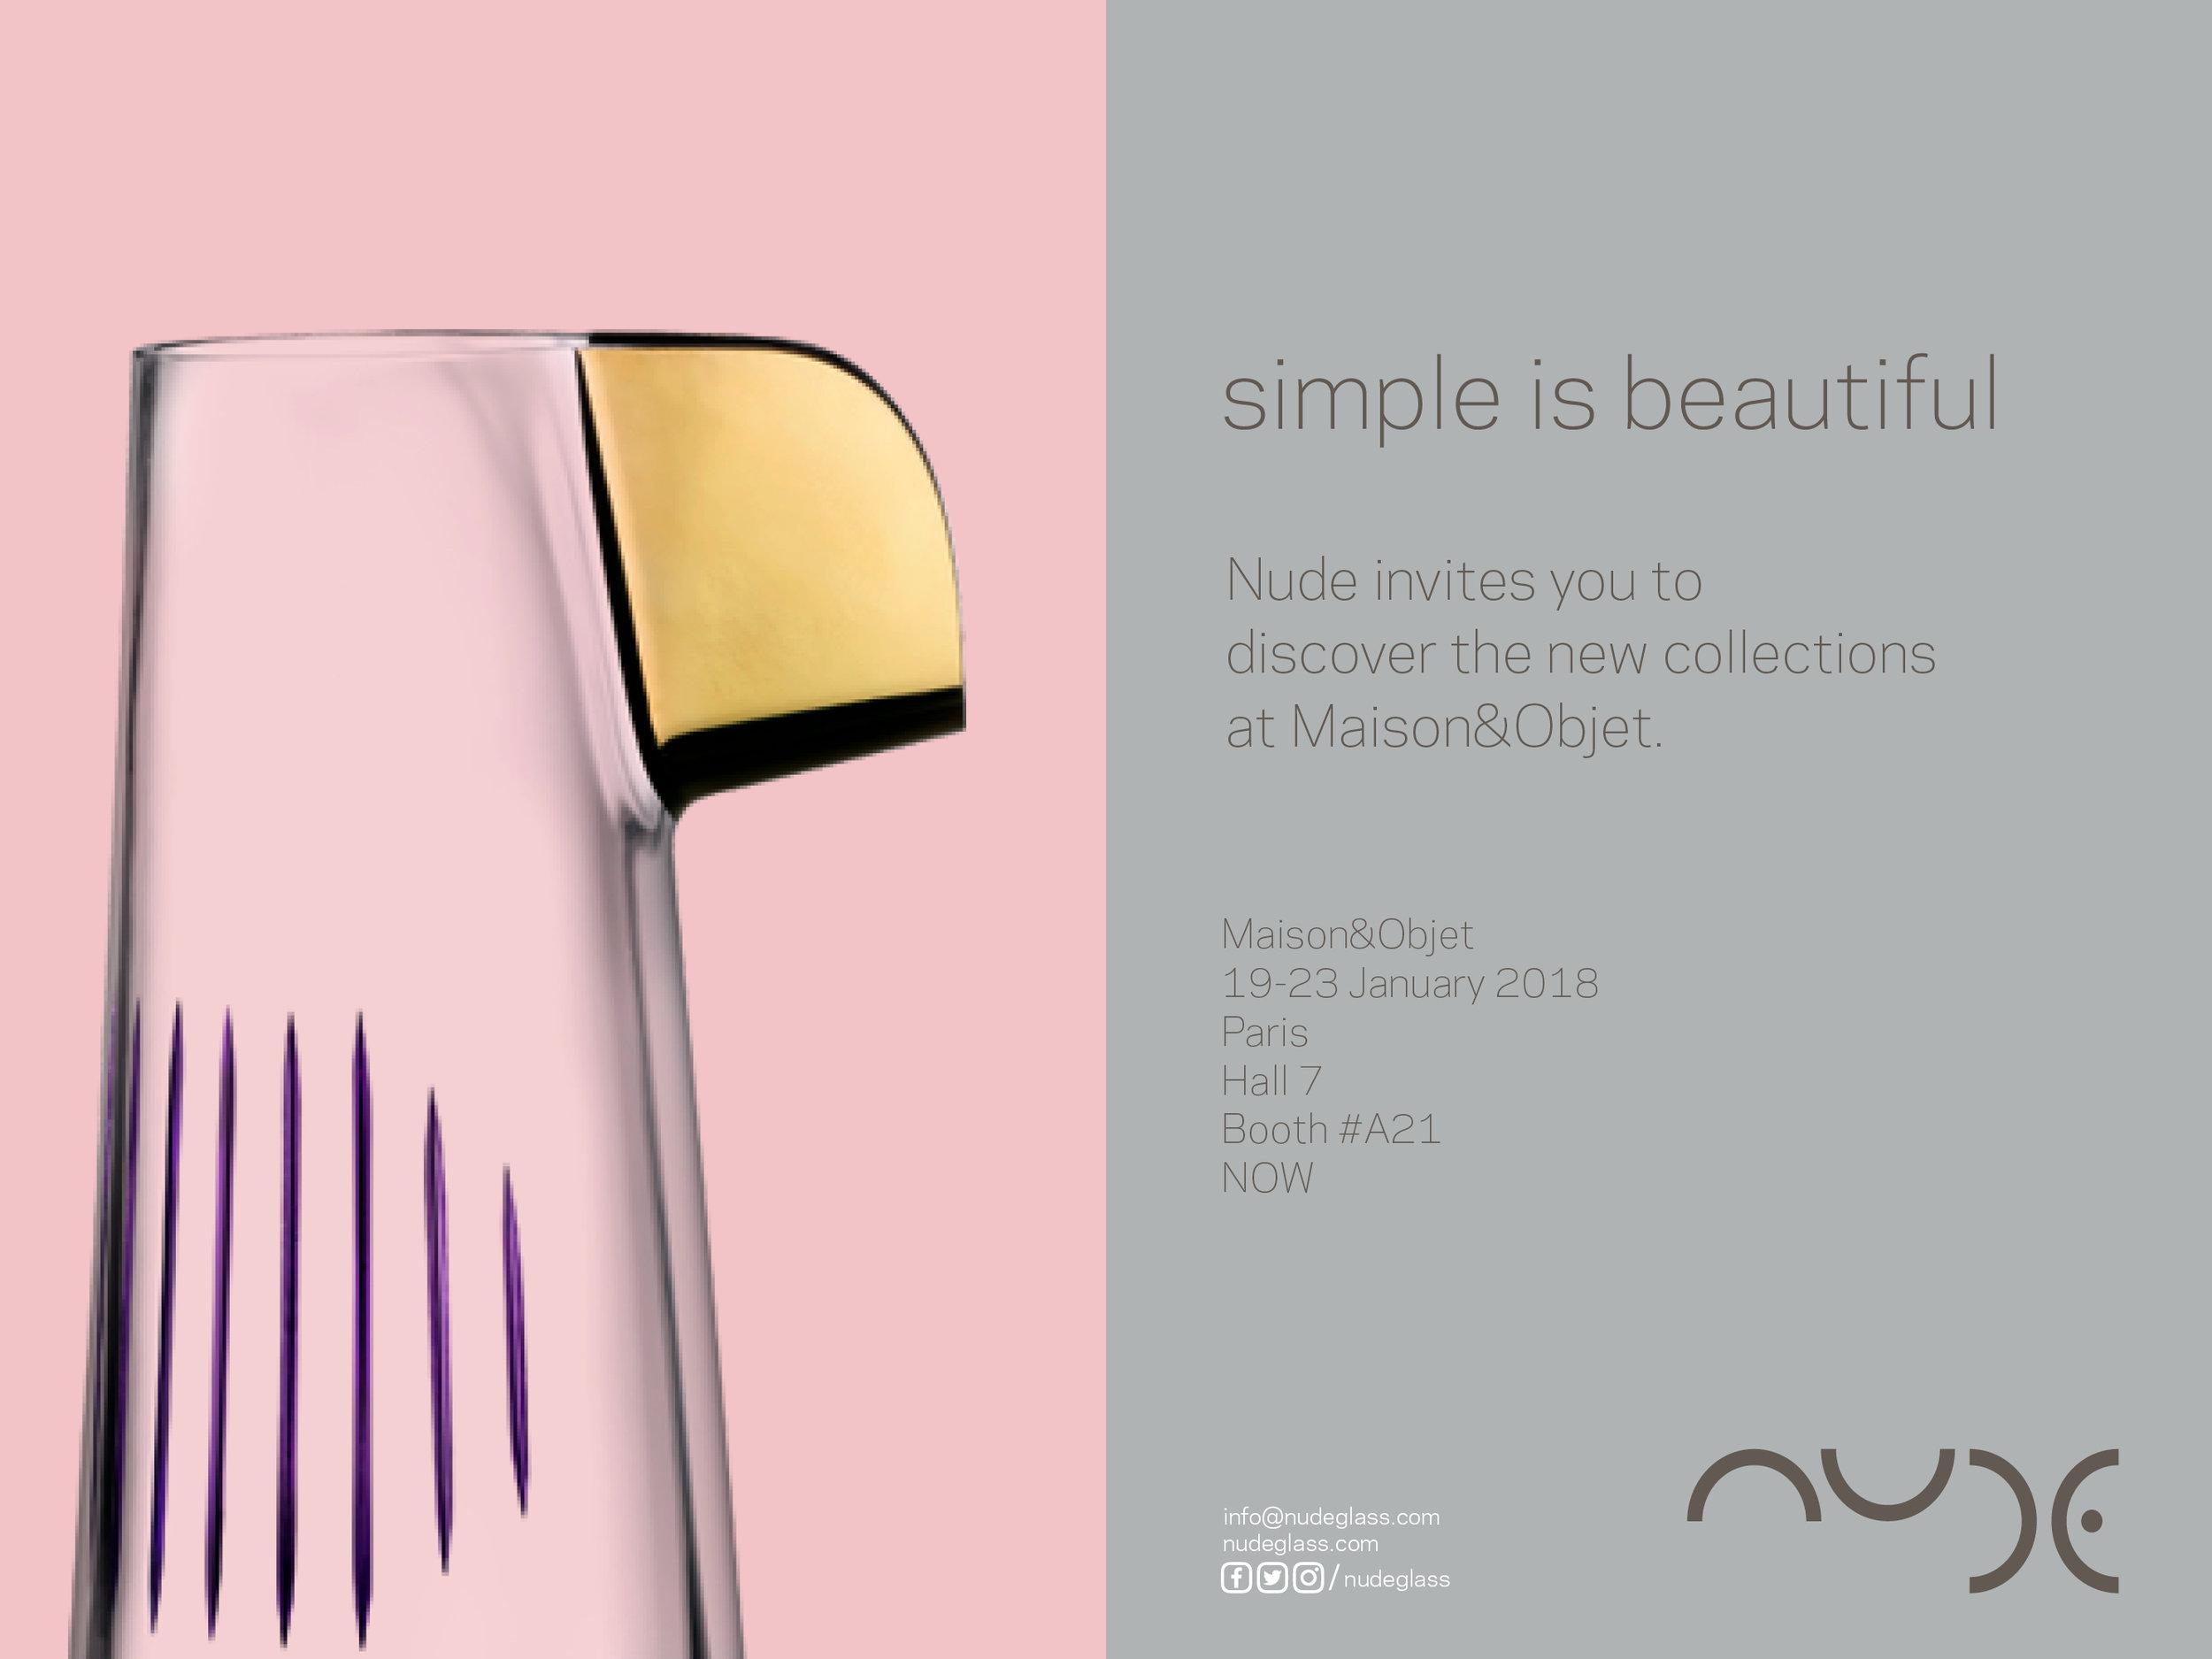 Nude Maison&Objet Invitation _Eng version.jpg